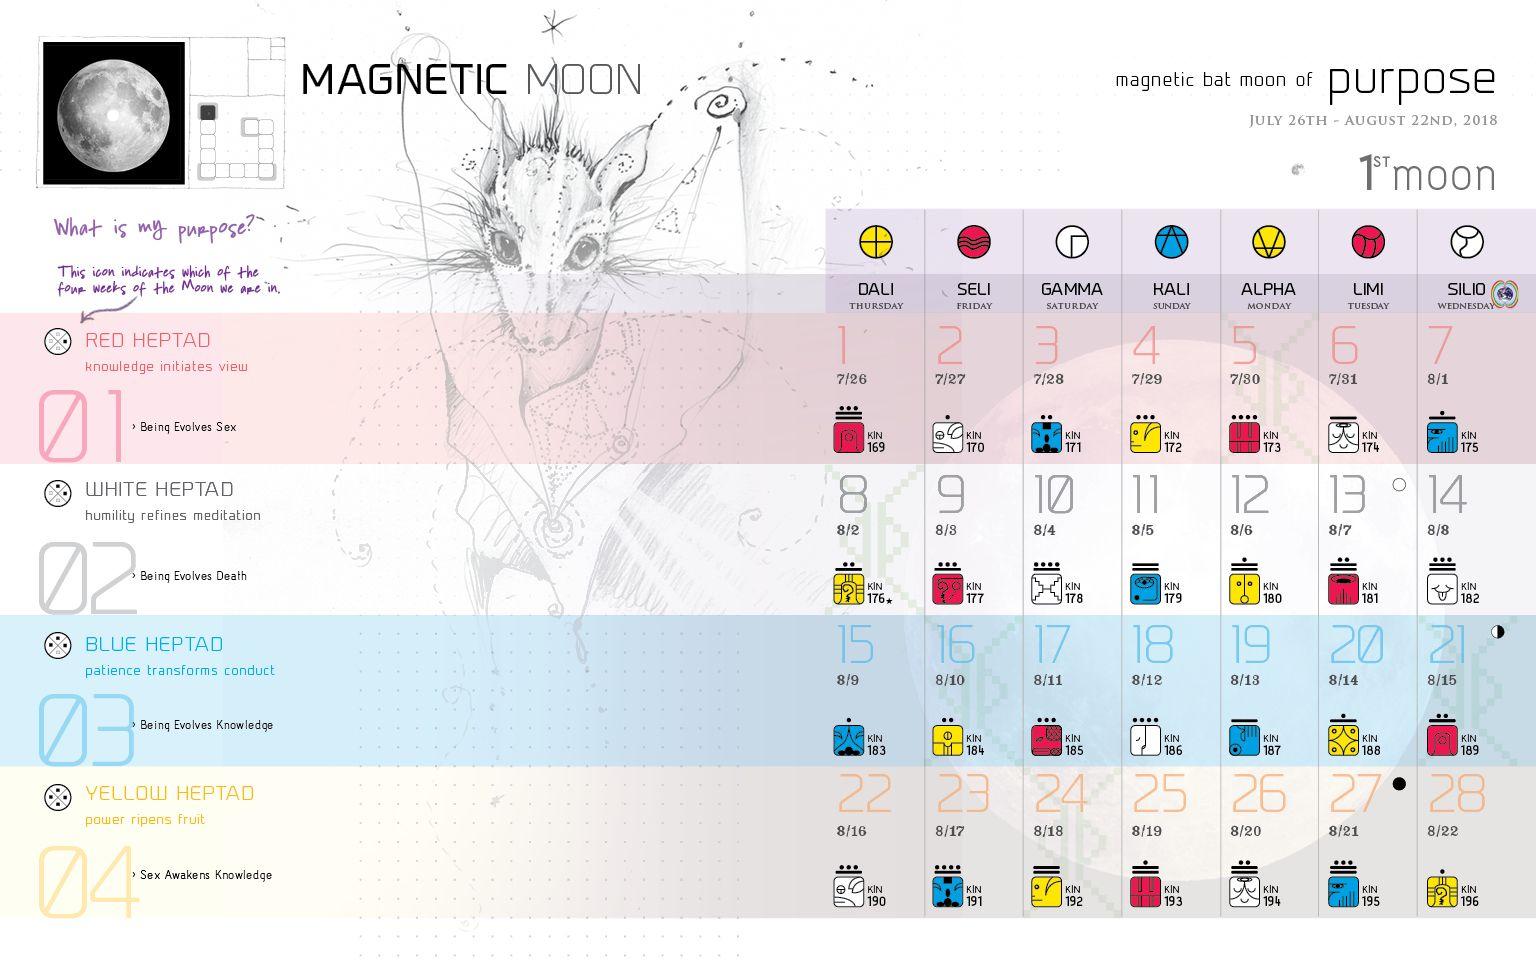 Star Traveler's 13 Moon Almanac of Synchronicity in 2020